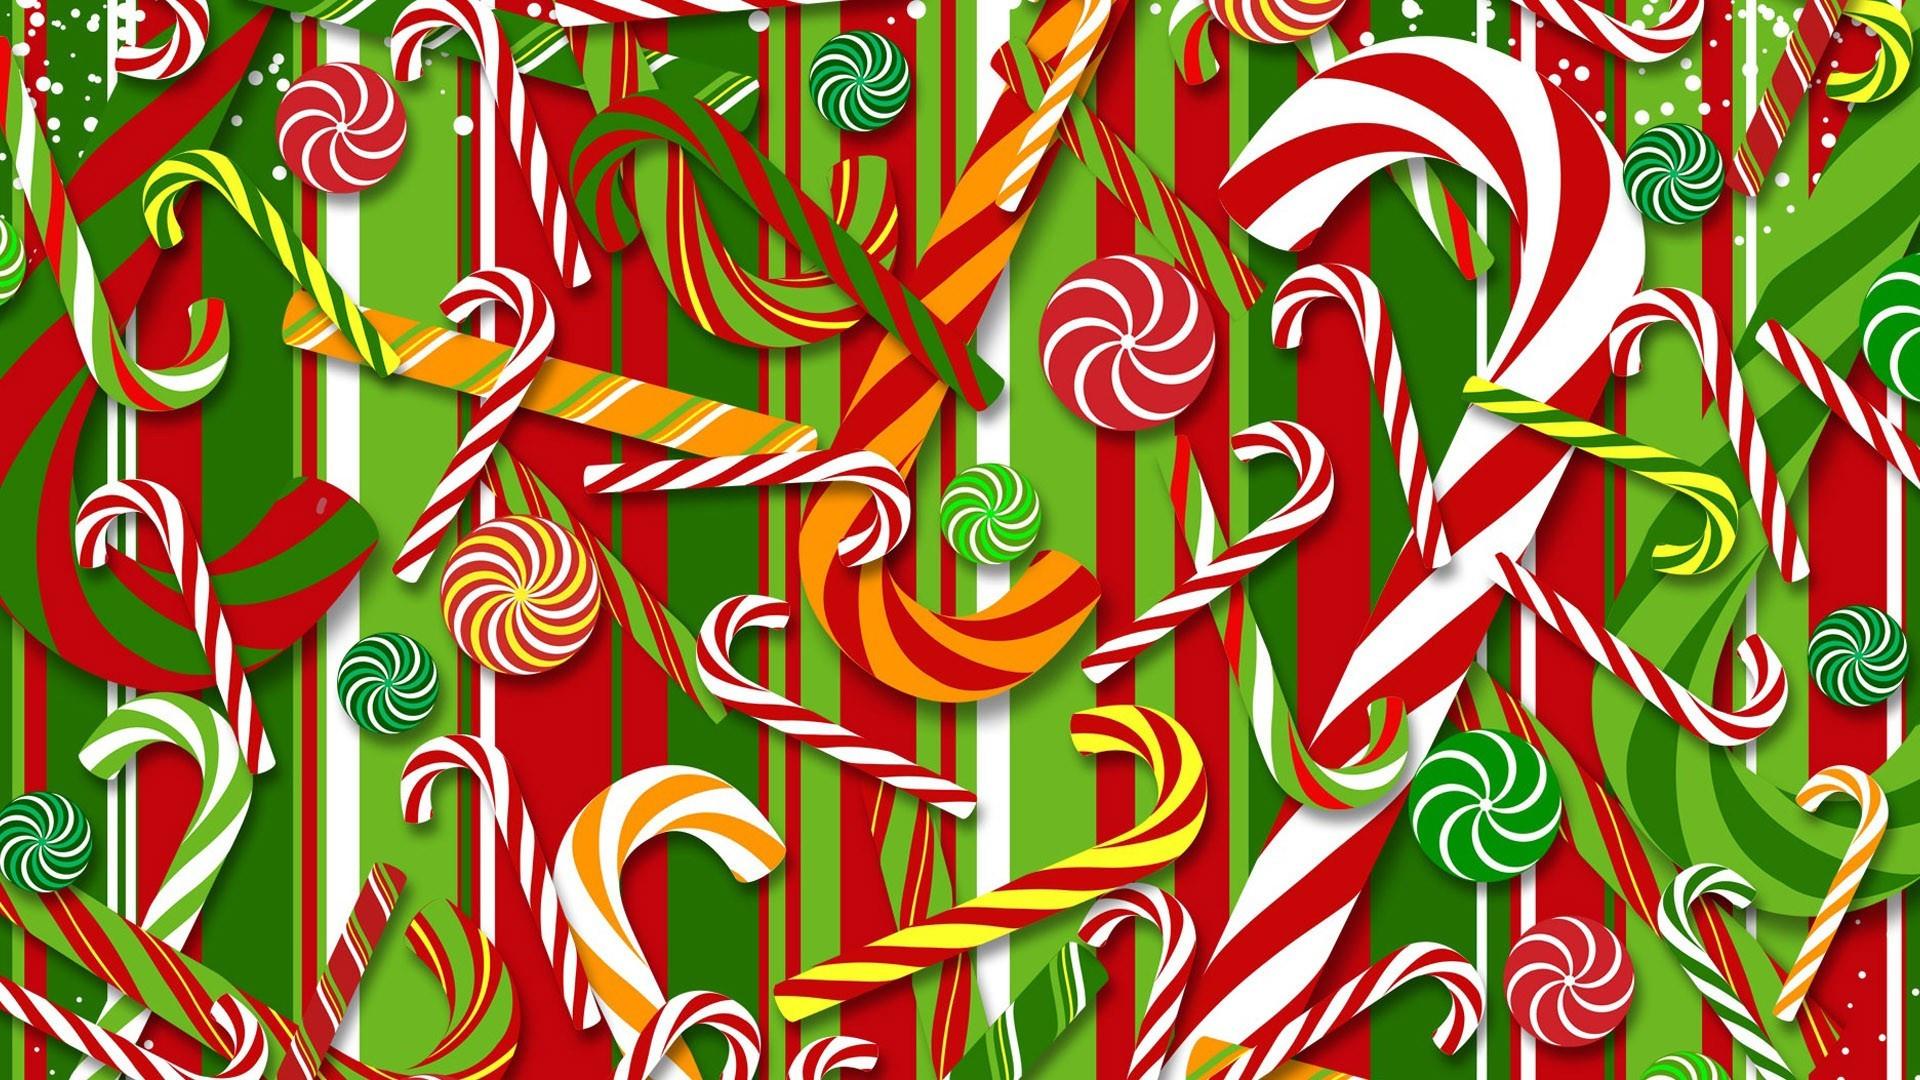 Christmas Candy Wallpaper  Christmas Candy Cane Wallpaper WallpaperSafari